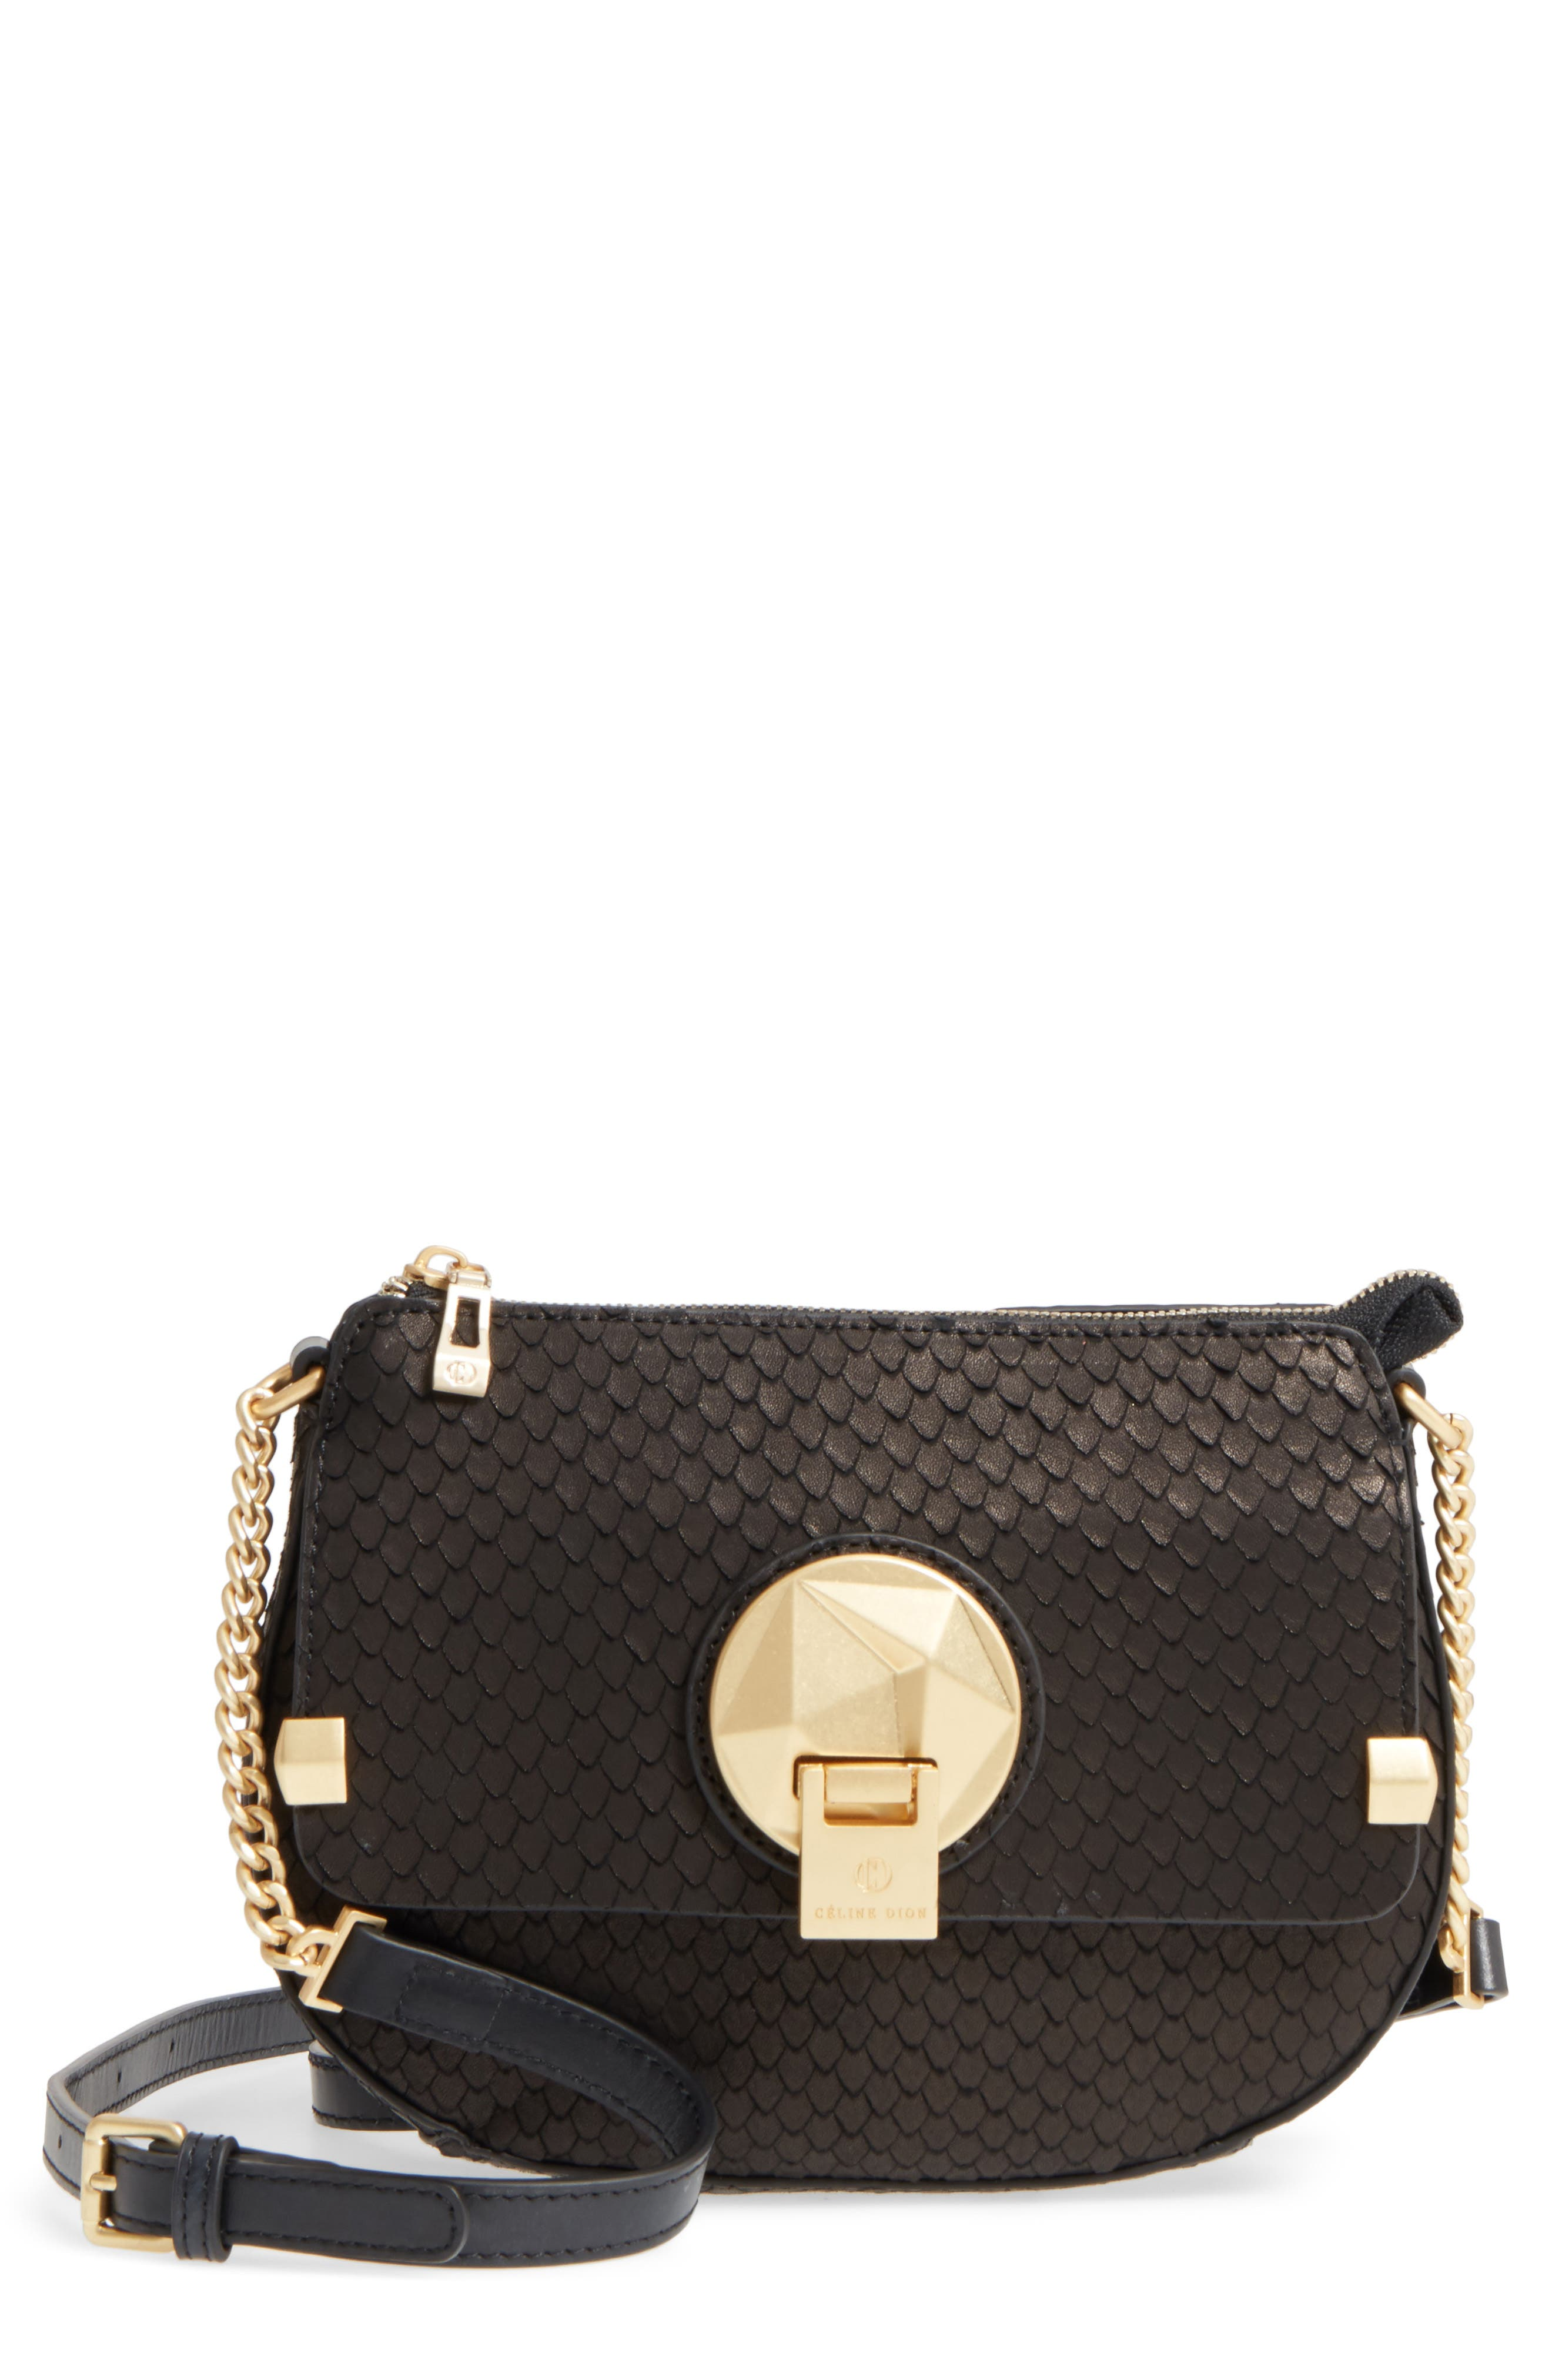 Céline Dion Octave Leather Crossbody Bag,                             Main thumbnail 1, color,                             Black Snake